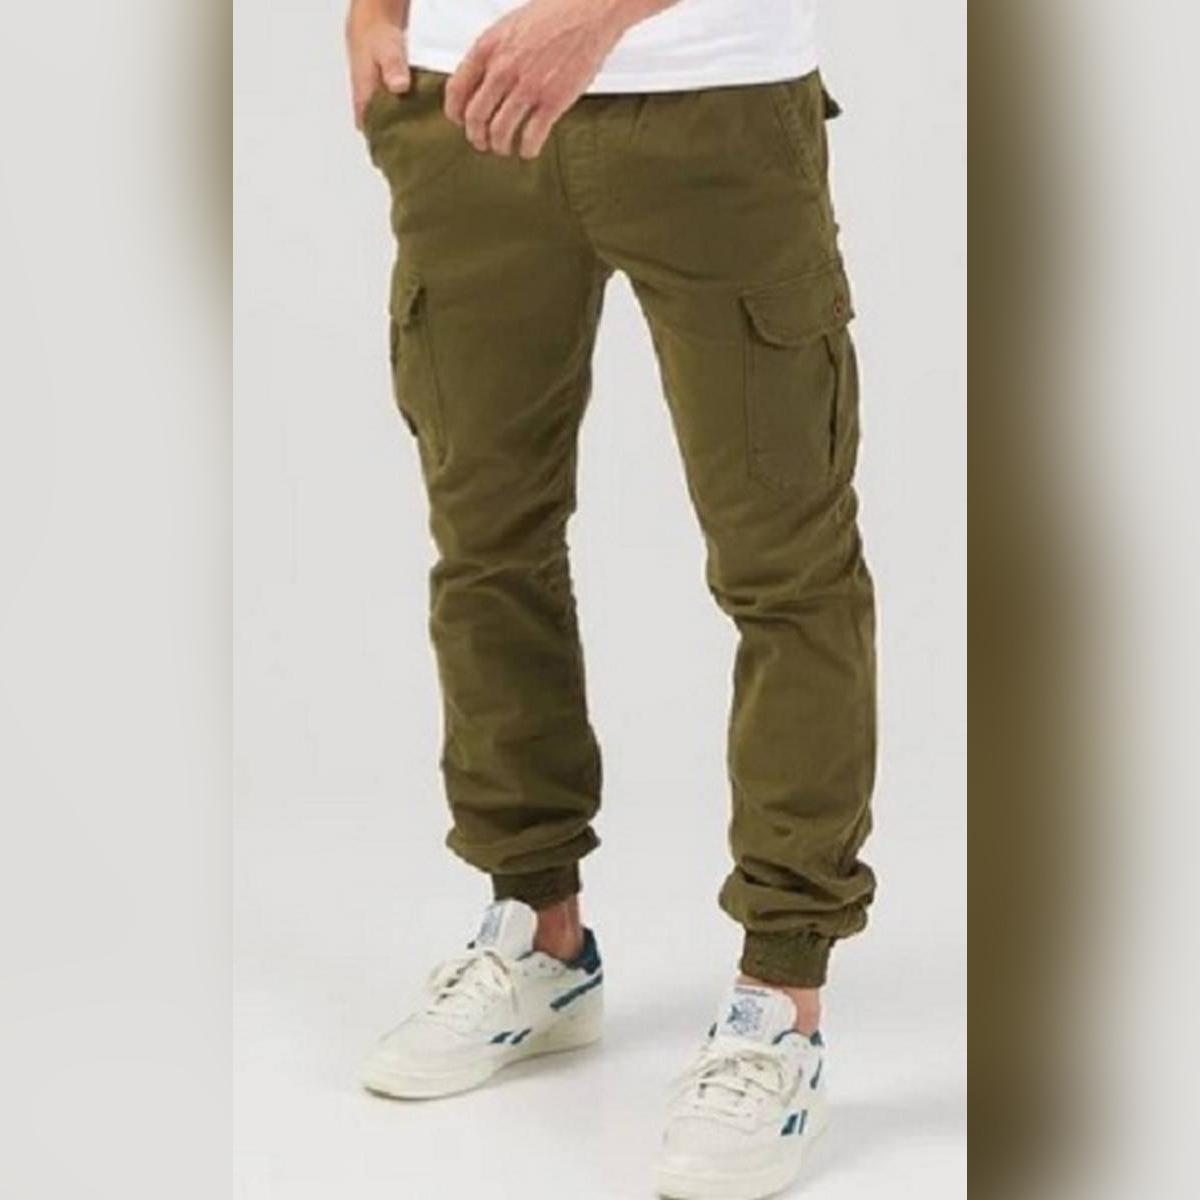 HashBack Olive Green Cargo Jogger for Men